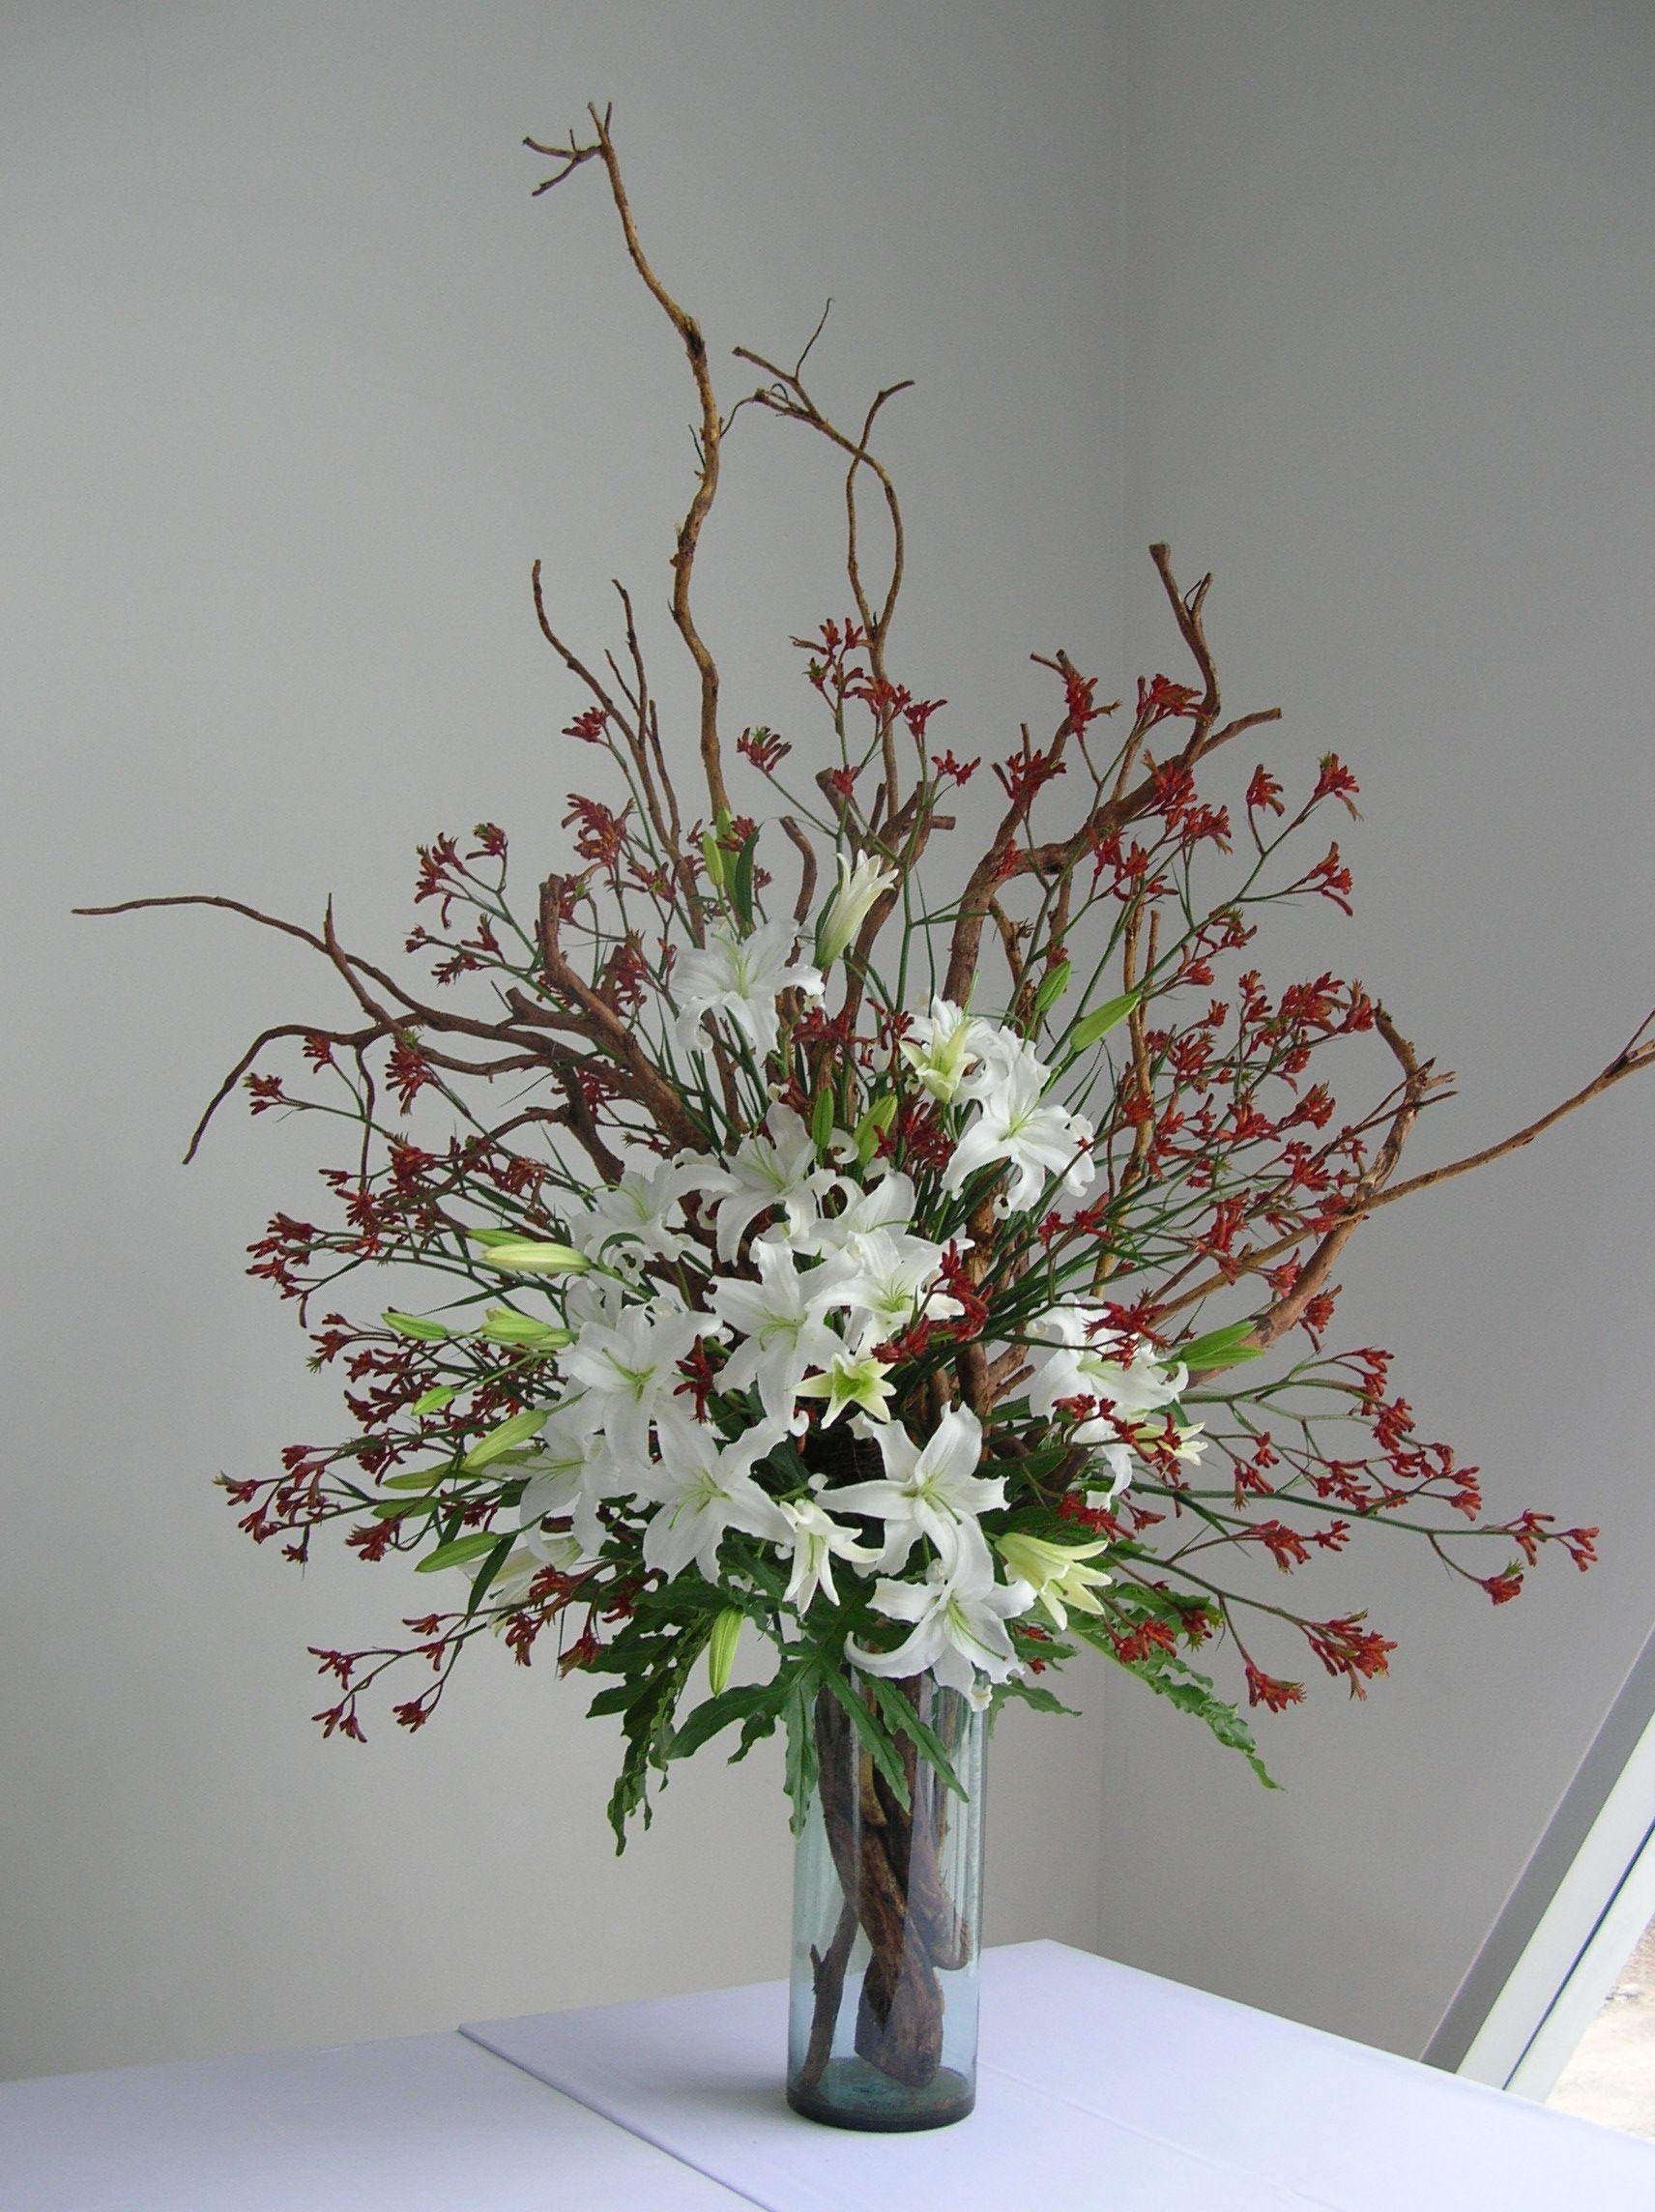 find this pin and more on lindos arreglos florales by carolherwig arreglo floral para mesa